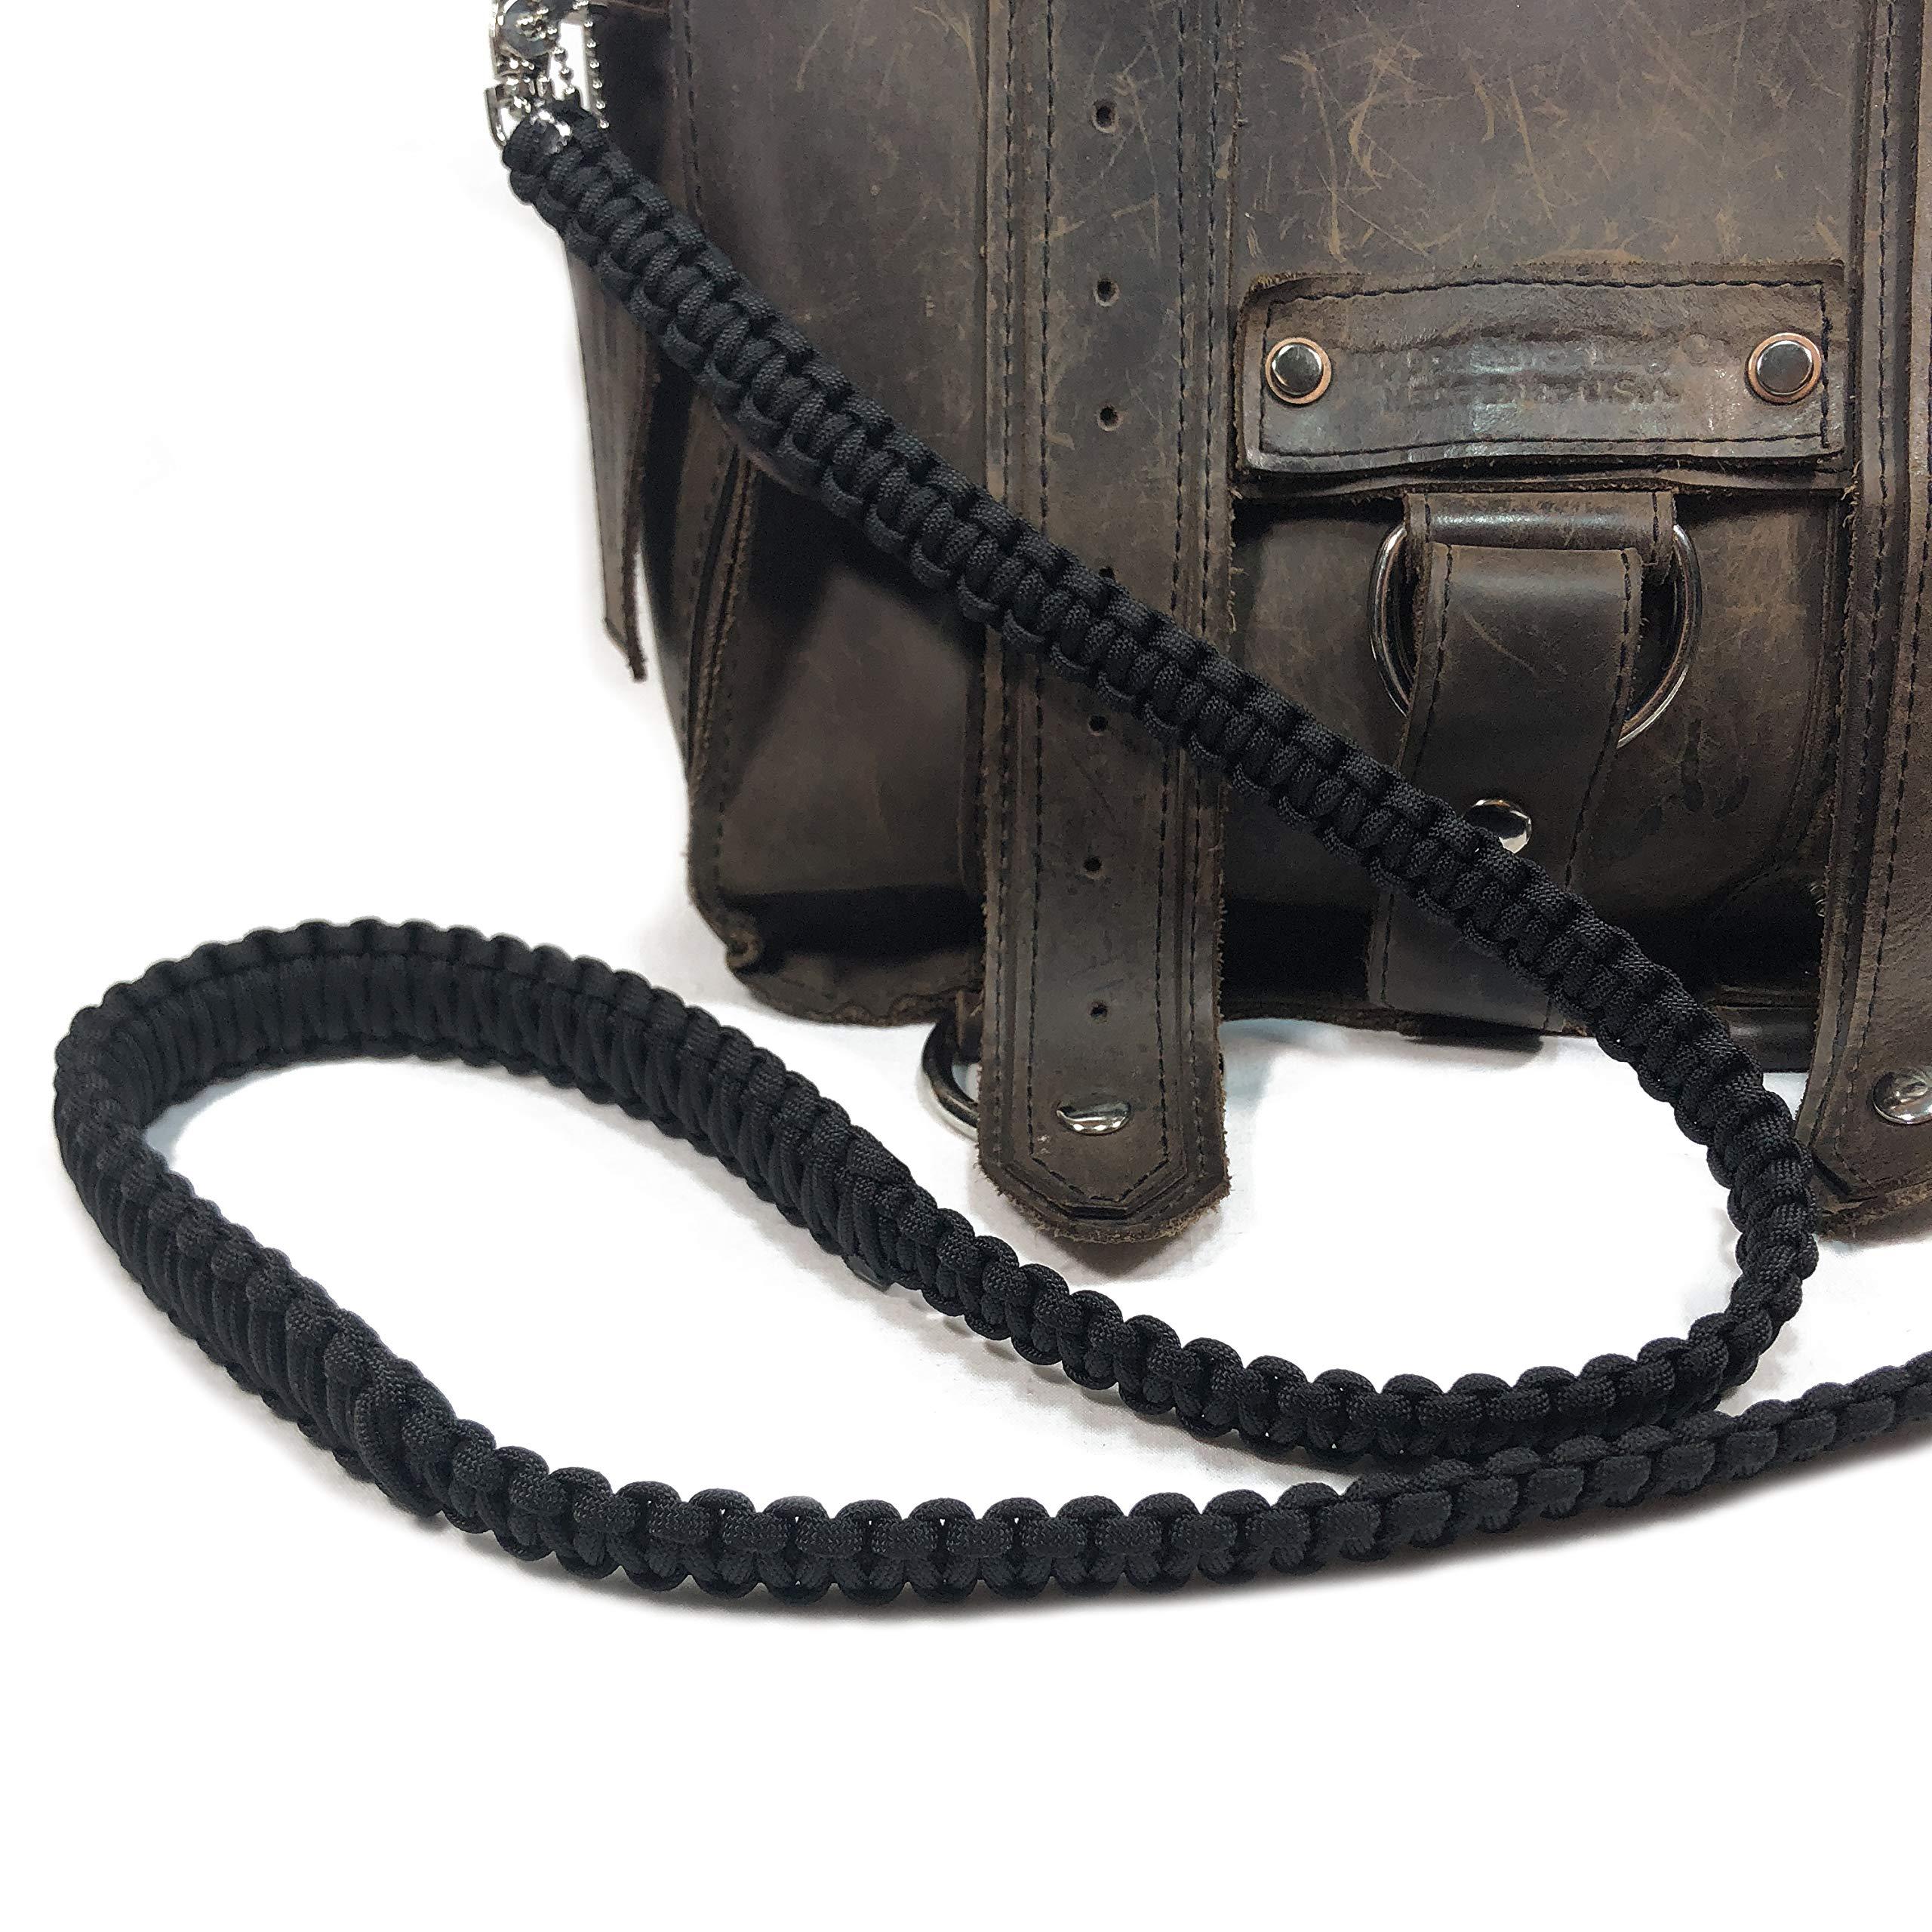 Black Paracord 46 inch Cross Body Shoulder Strap, Handbag, Satchel Strap, Duffel Bag, Lunch Bag